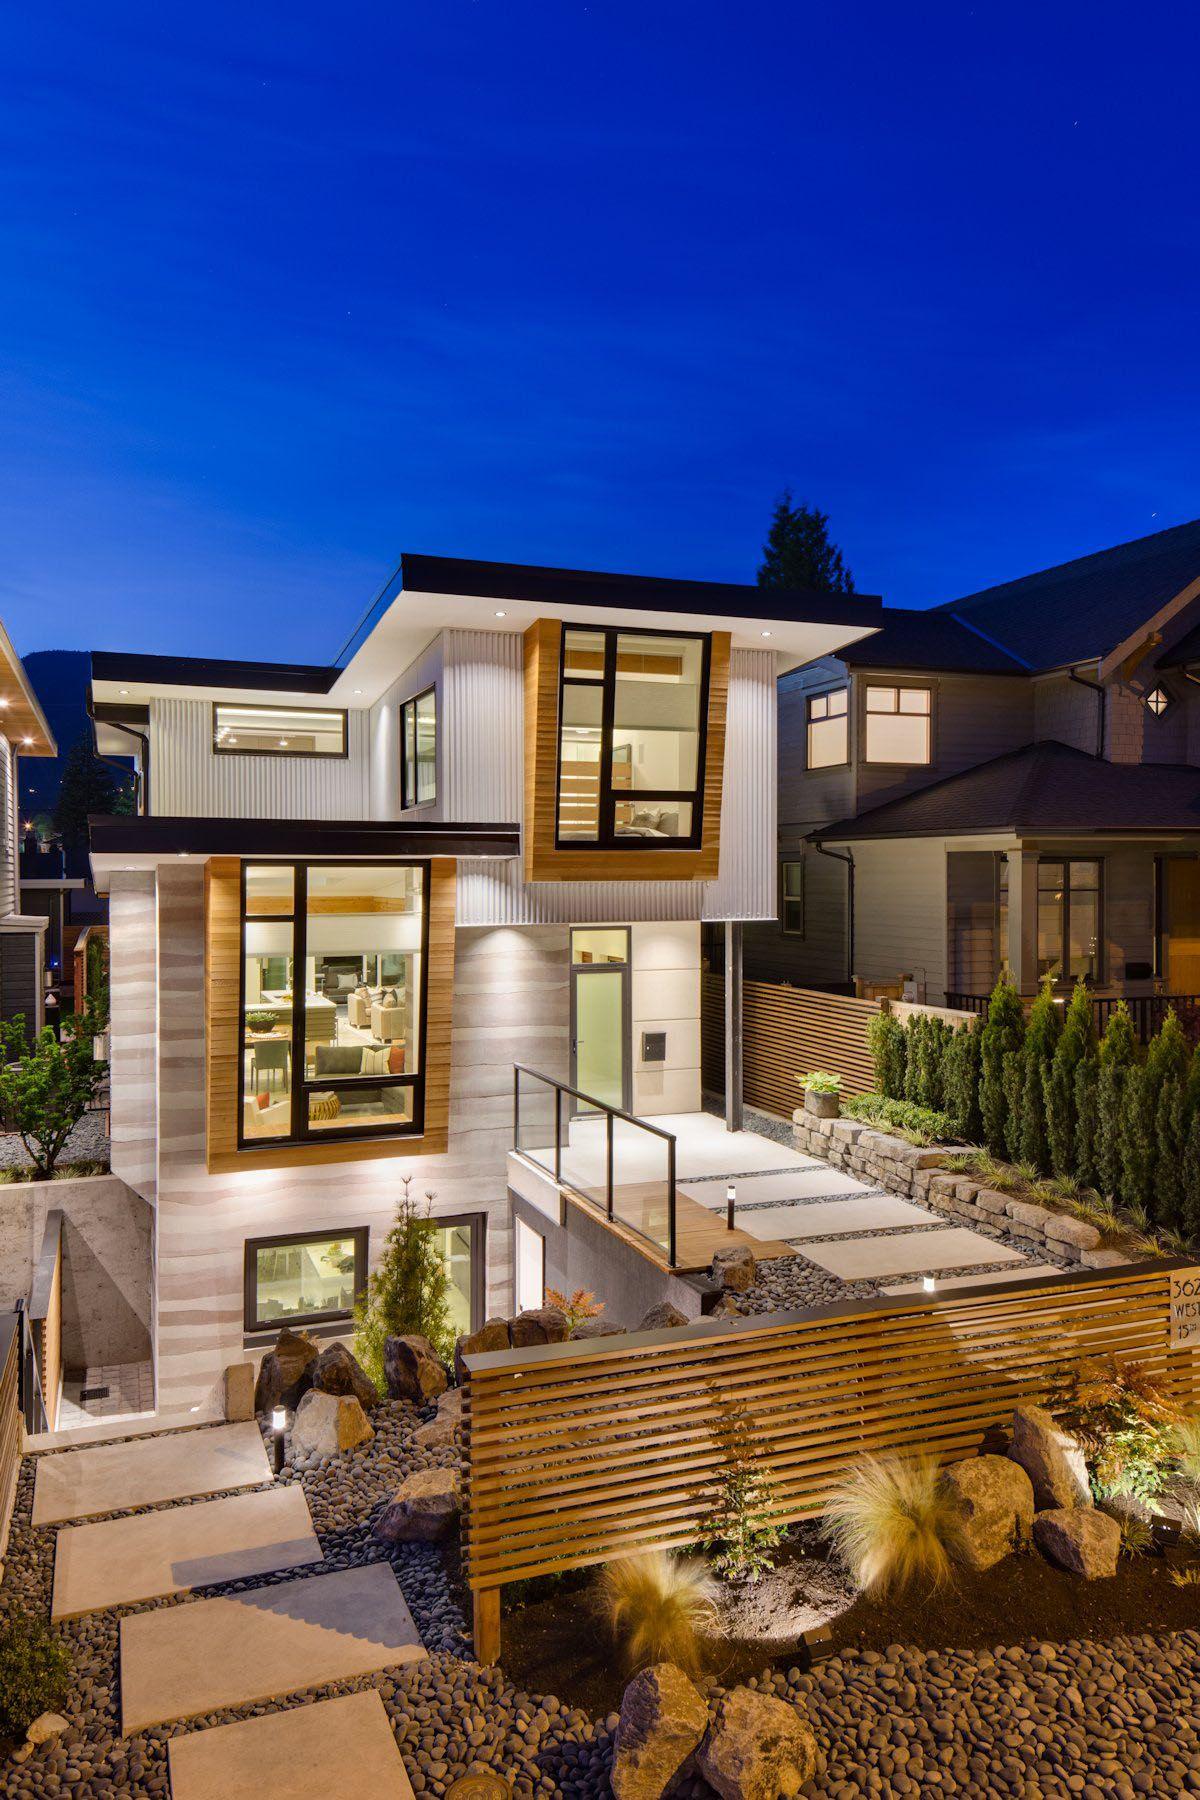 Bon Midori Uchi By Naikoon Contracting And Kerschbaumer Design 3 Award Winning  High Class Ultra Green Home